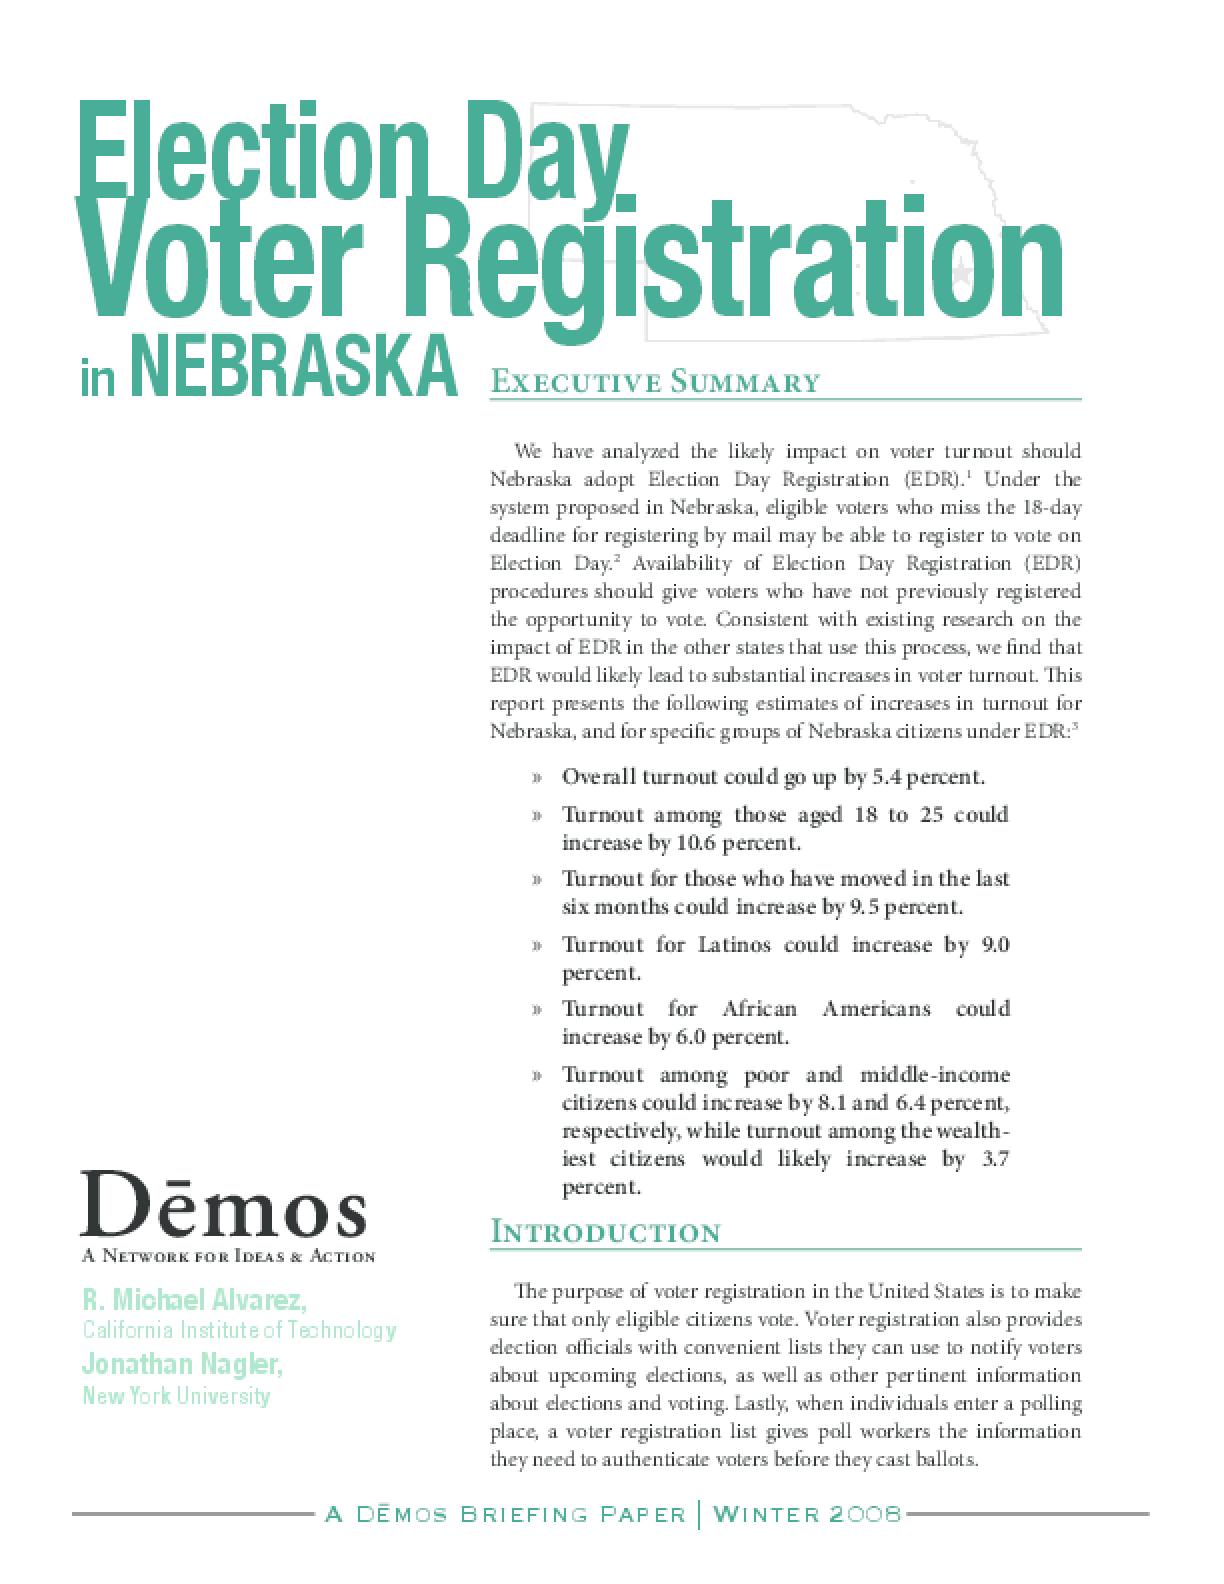 Election Day Voter Registration in Nebraska